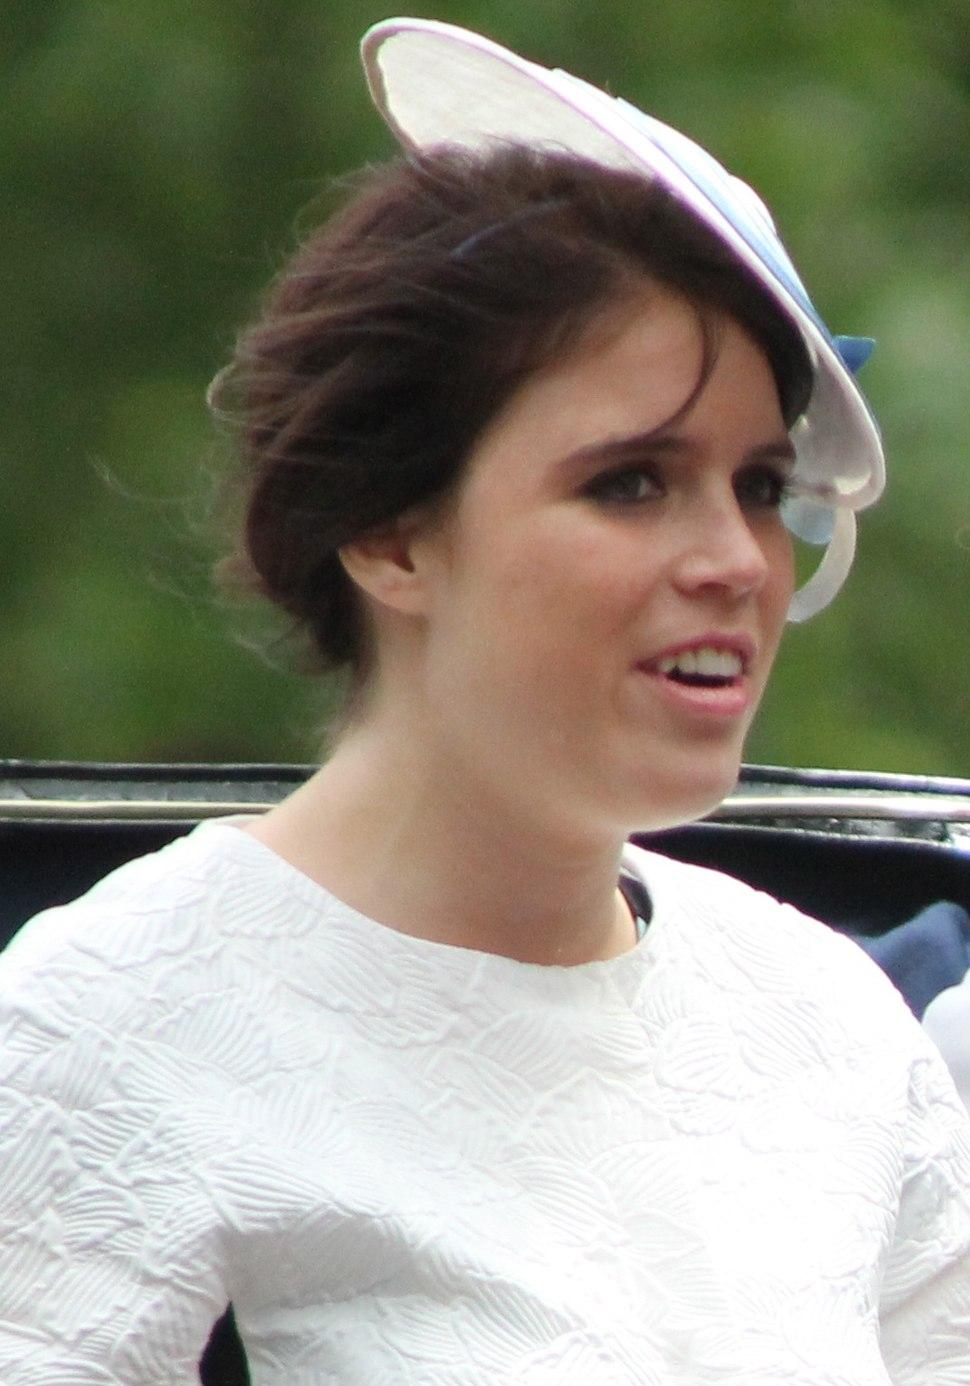 Princess Eugenie, 2013 (cropped)